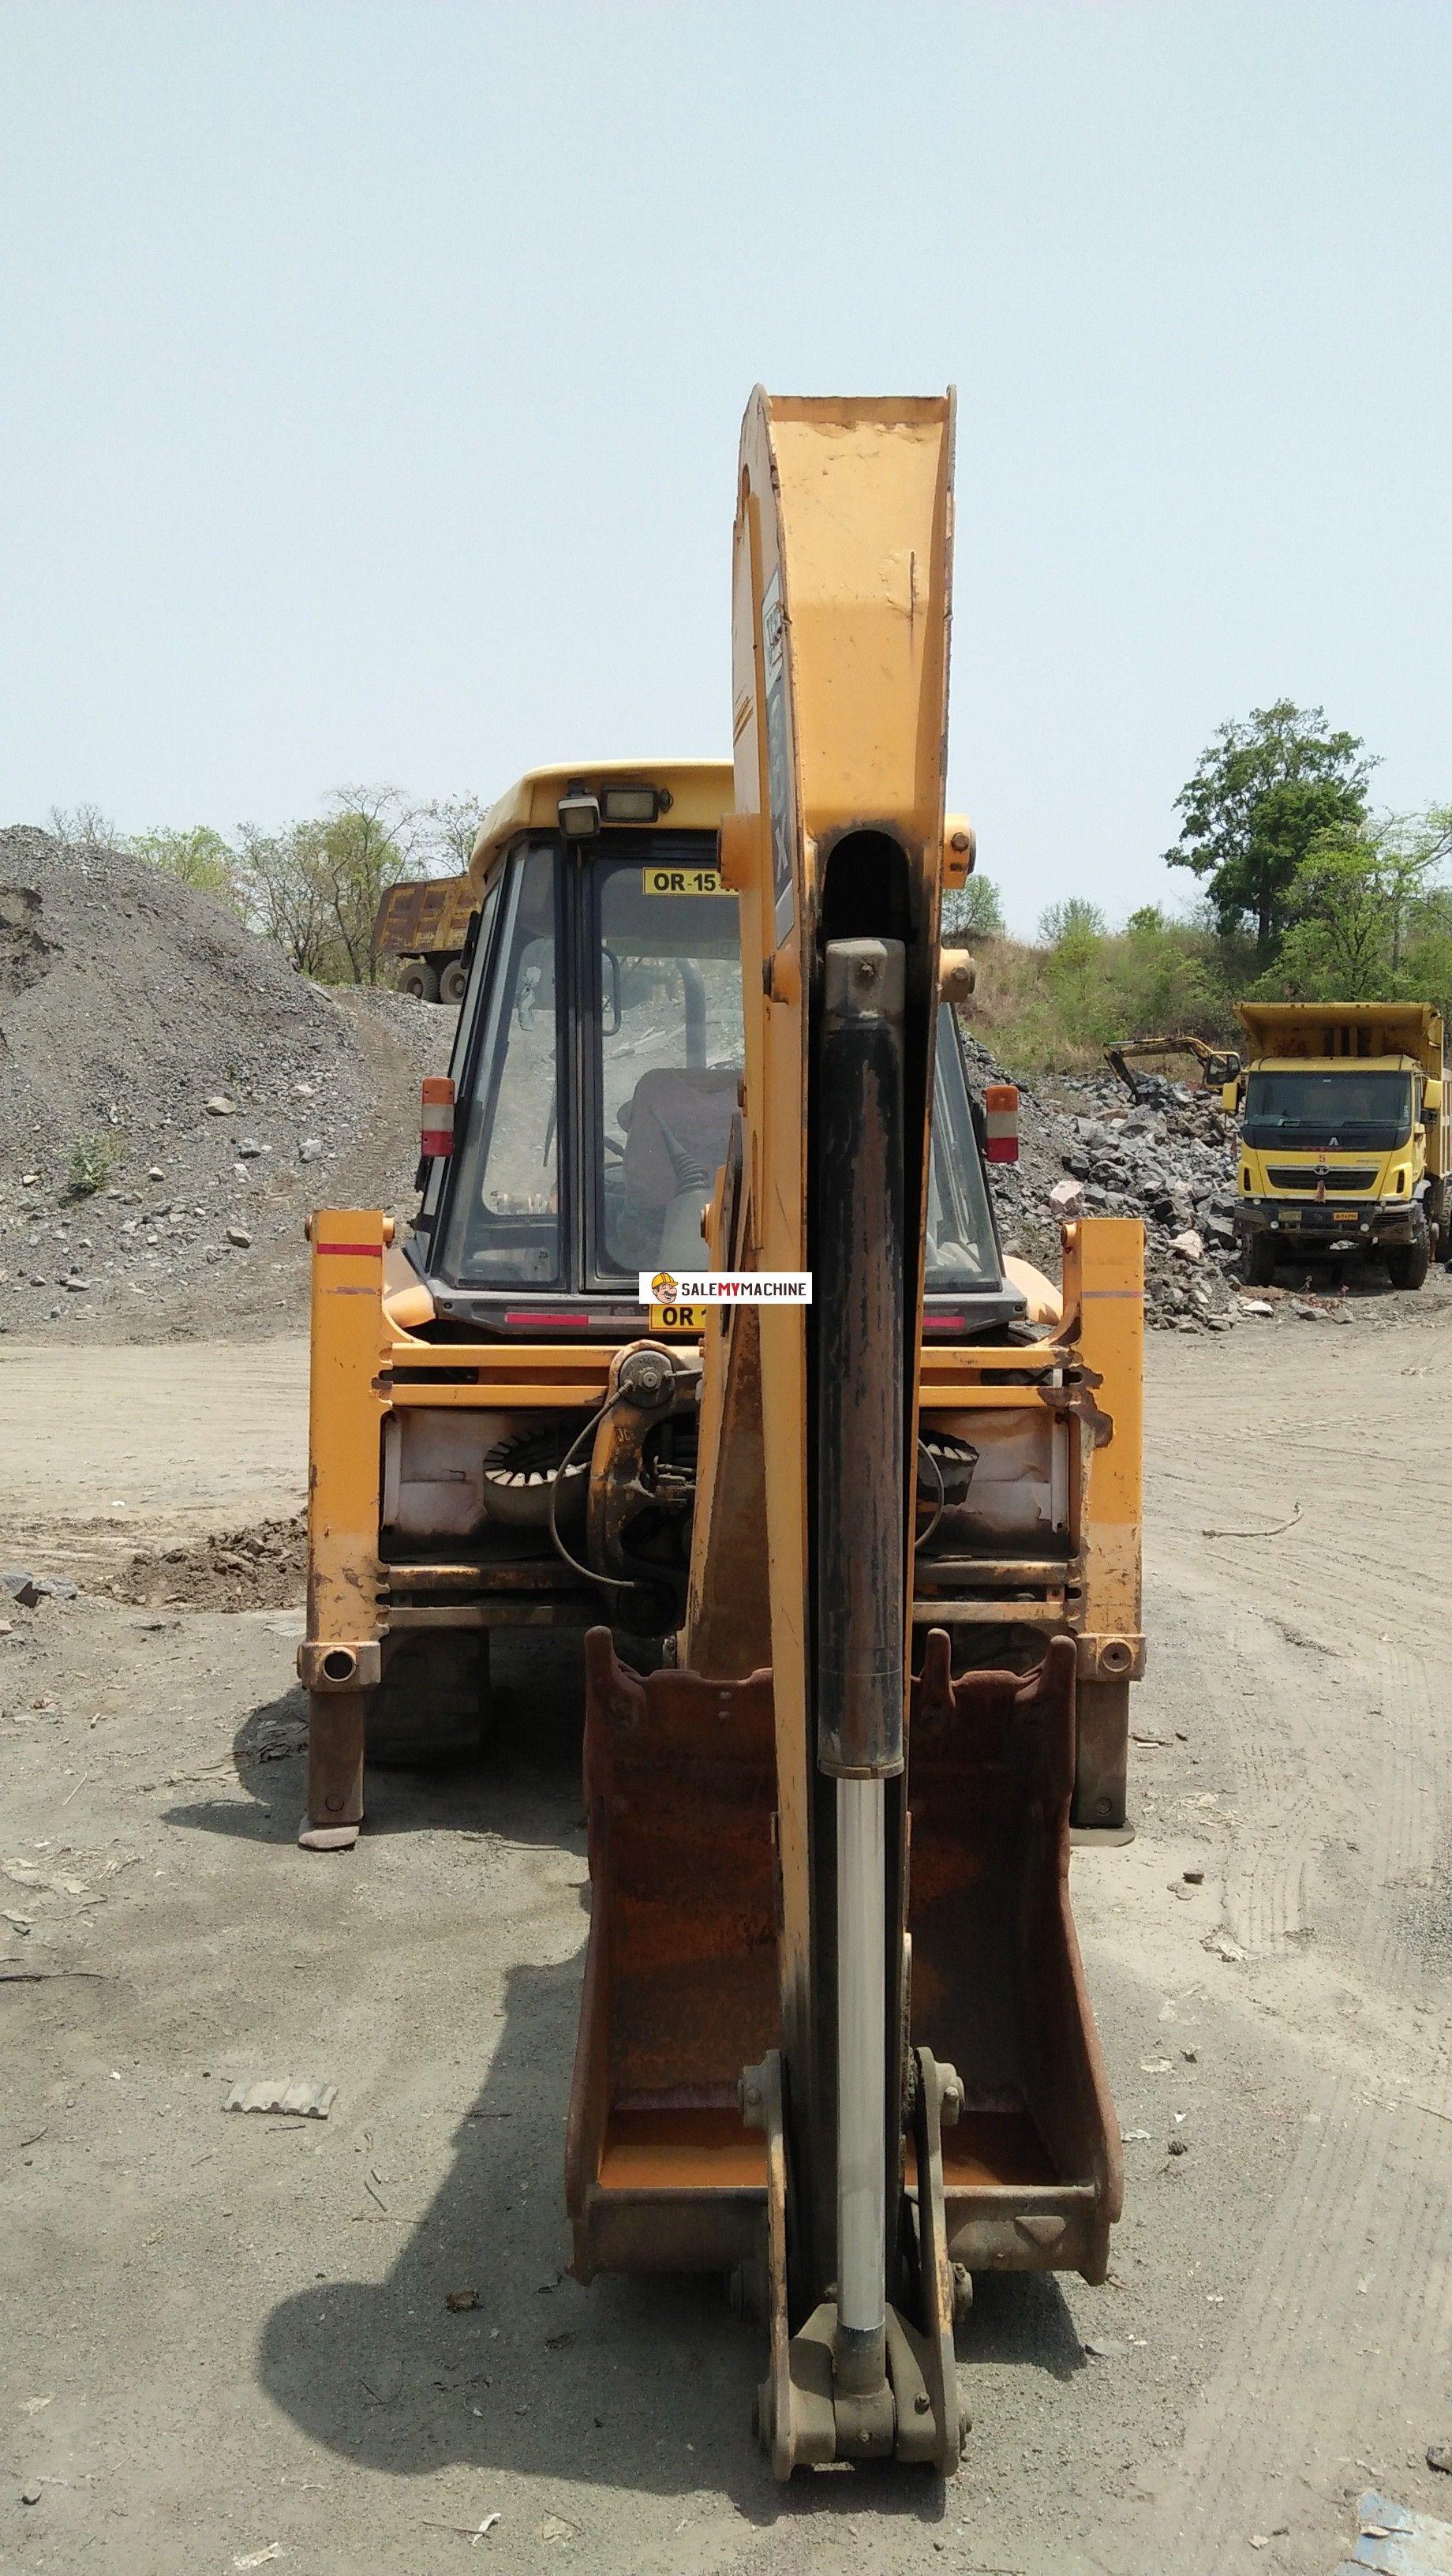 Used JCB 3DX for sale in odisha,india at